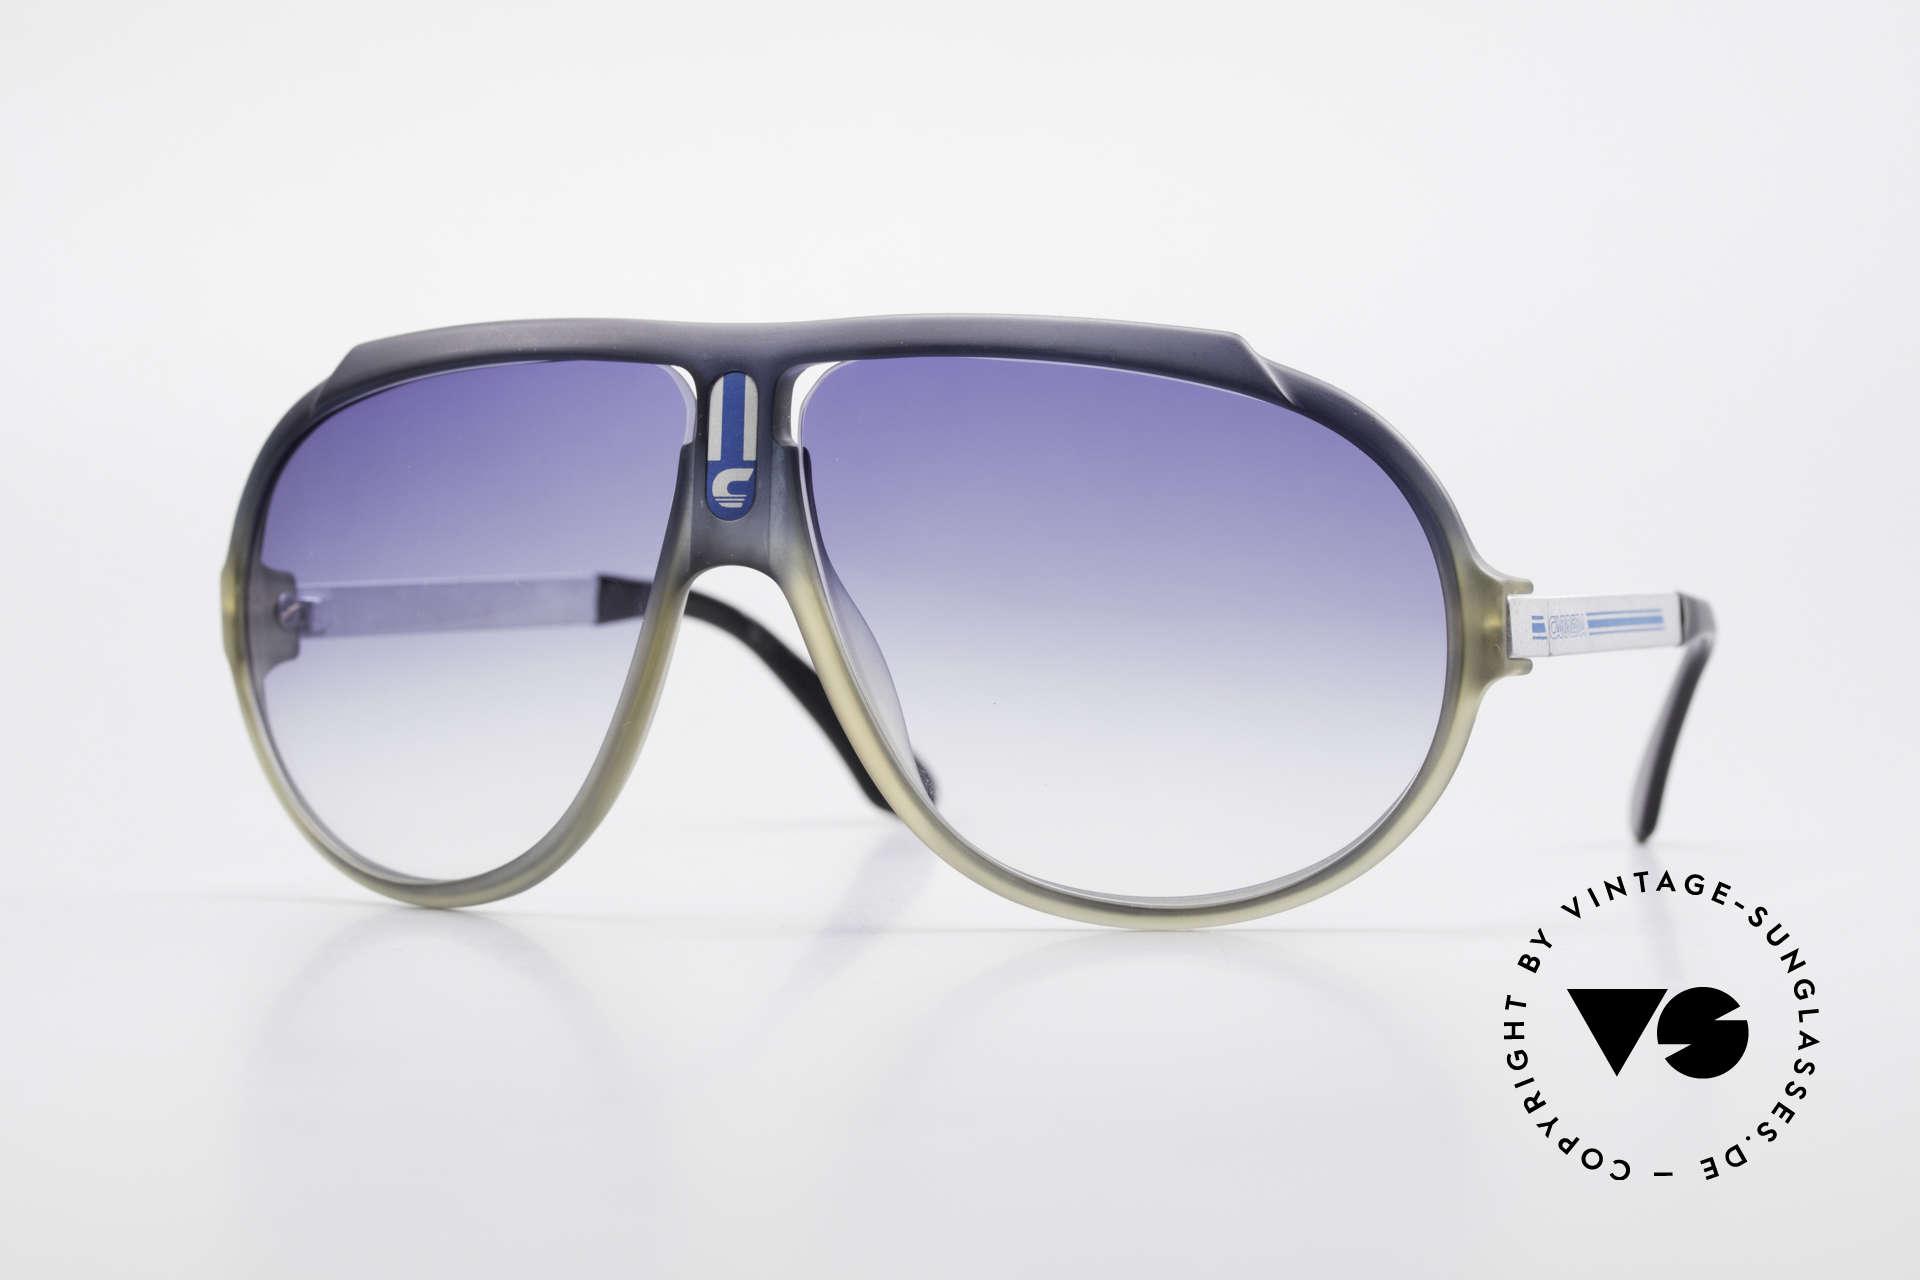 Carrera 5512 Miami Vice 1980's Sunglasses, legendary 1980's vintage CARRERA designer sunglasses, Made for Men